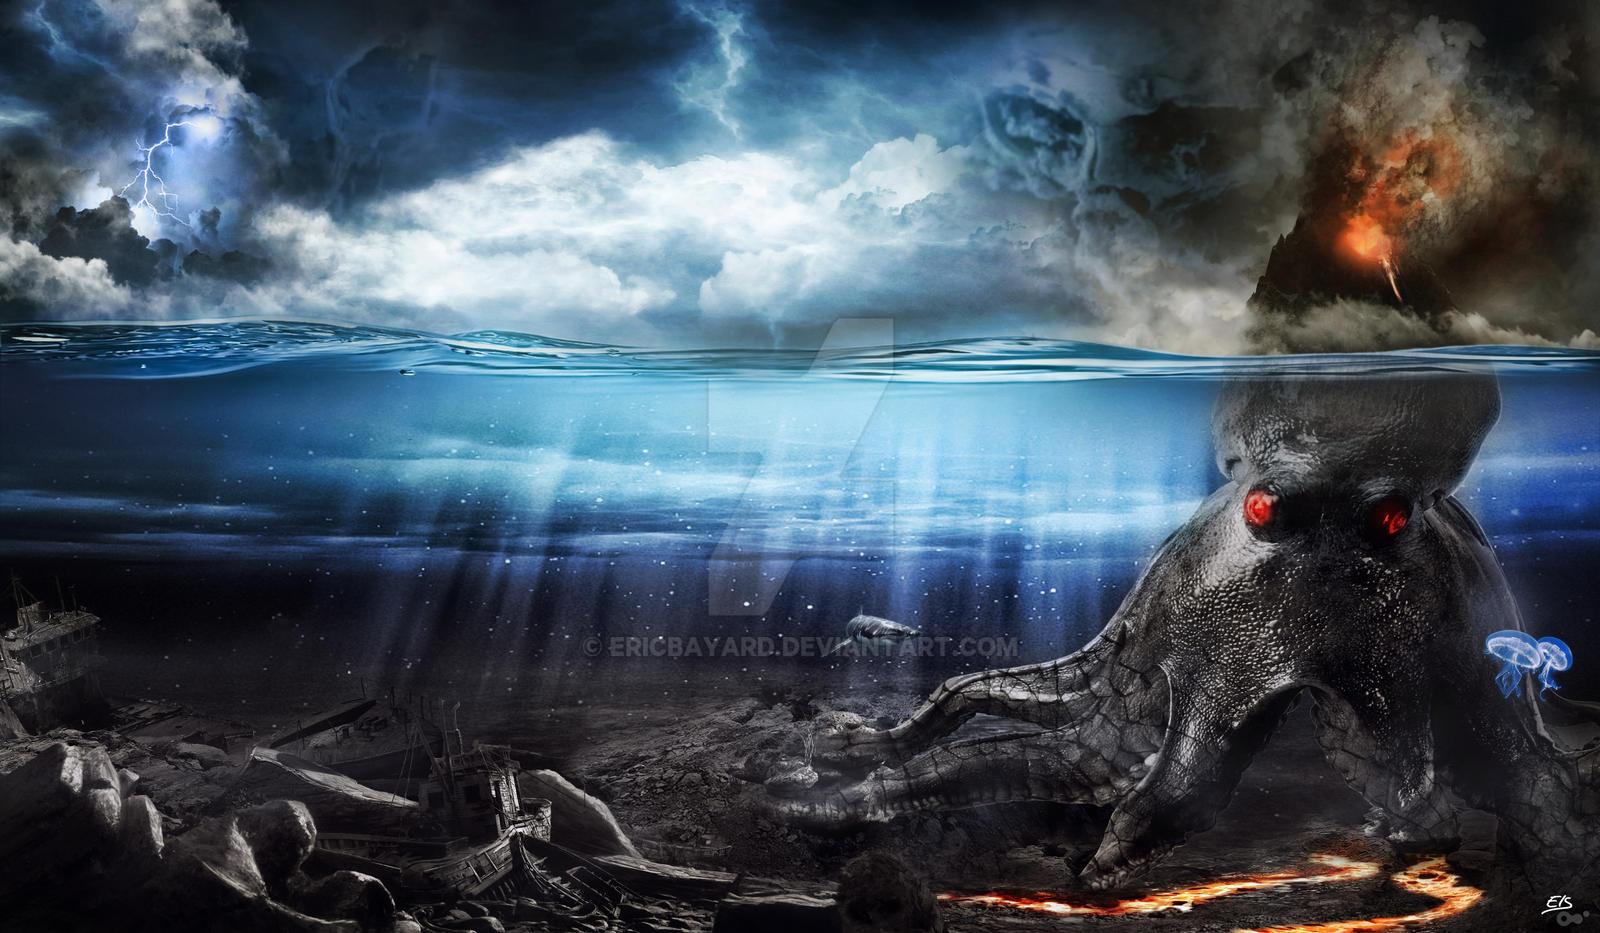 Twenty Thousand Leagues Under the Sea. by ericbayard